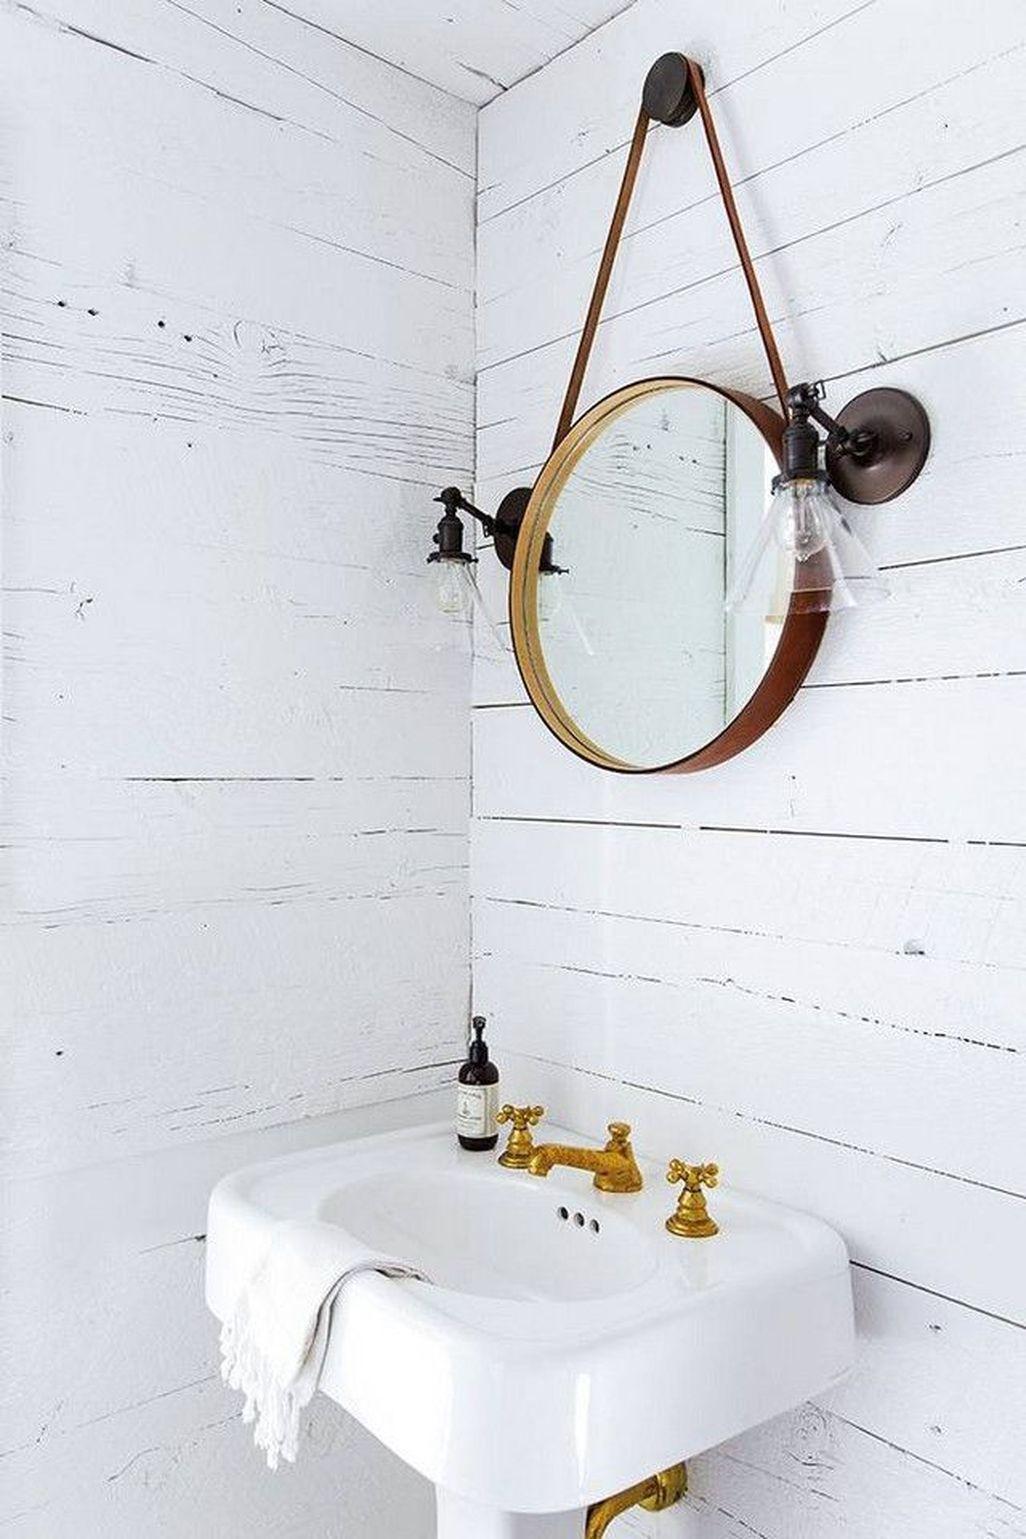 45 Ispiring Rustic Small Bathroom Wood Decor Design ...